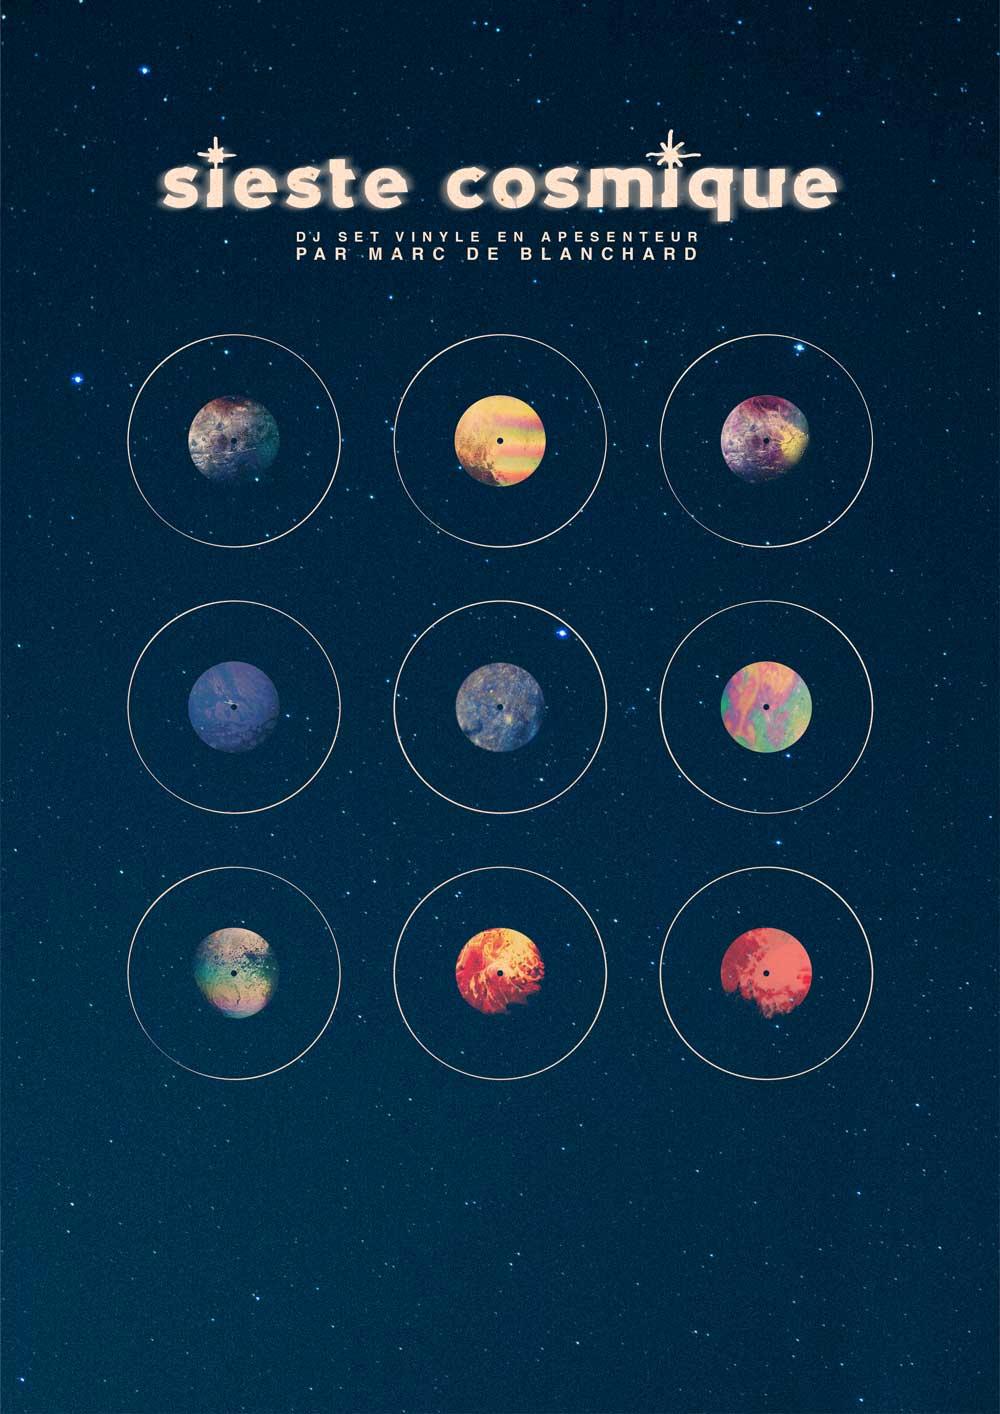 Sieste cosmique